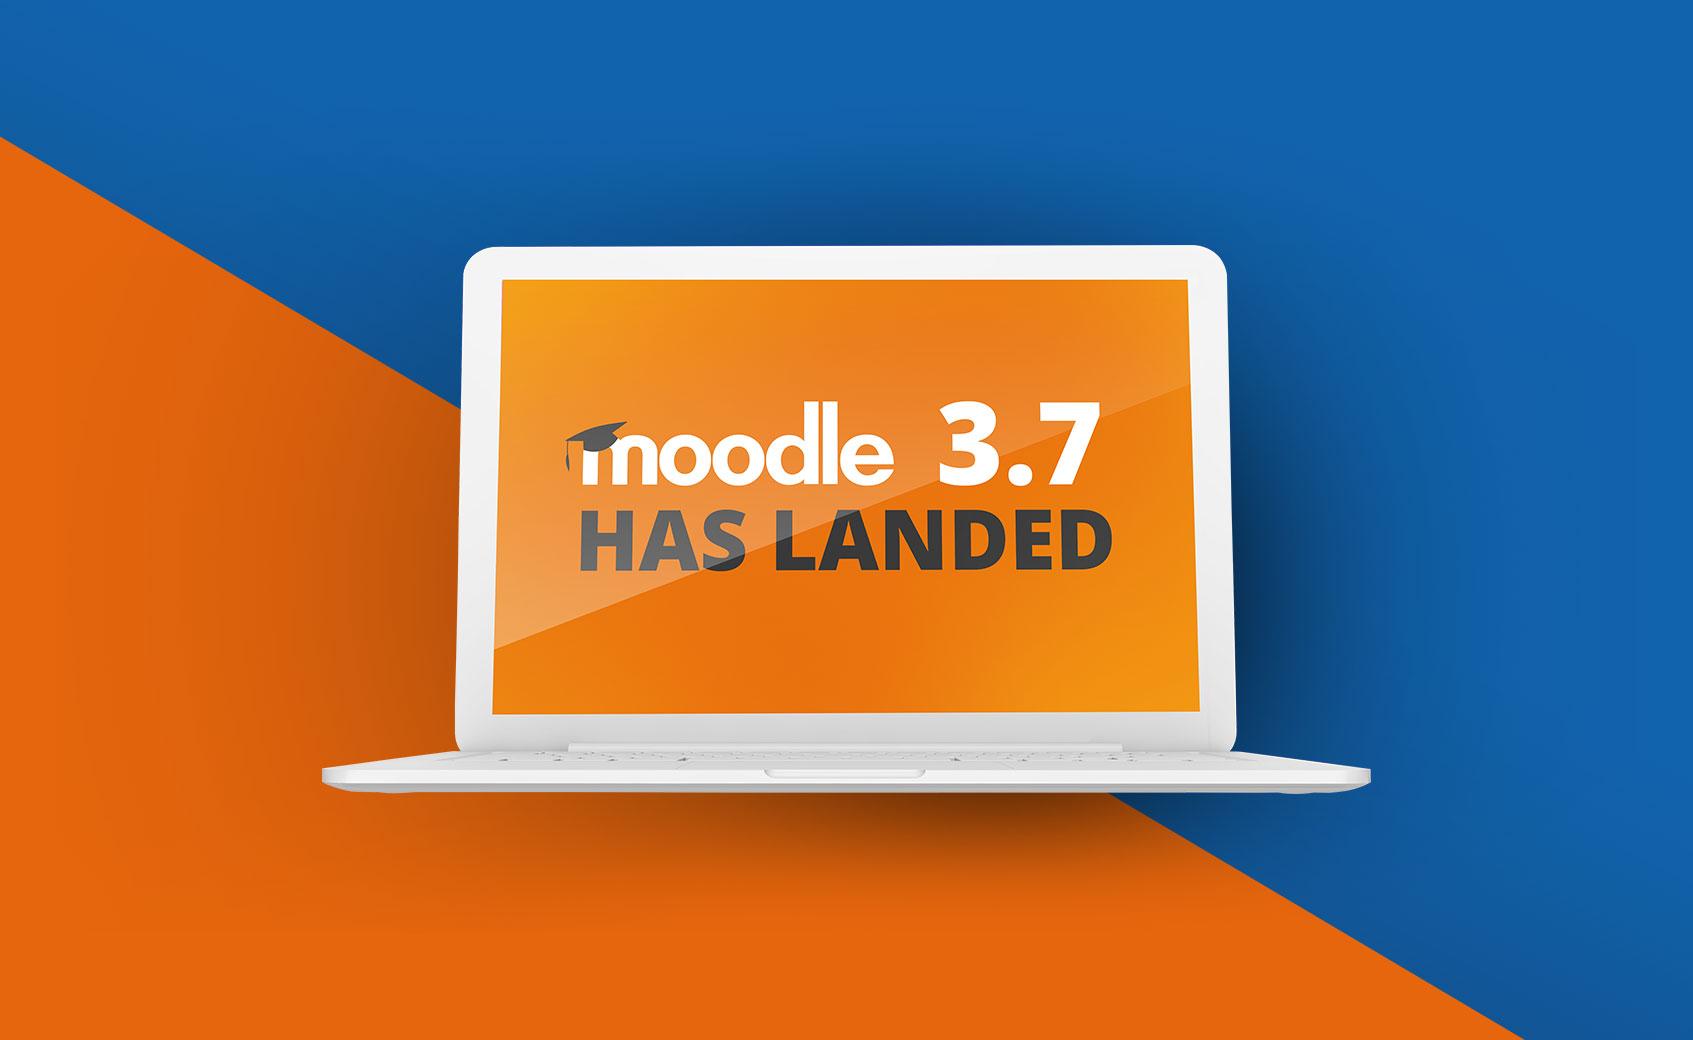 Moodle 3.7 has landed! Thumbnail